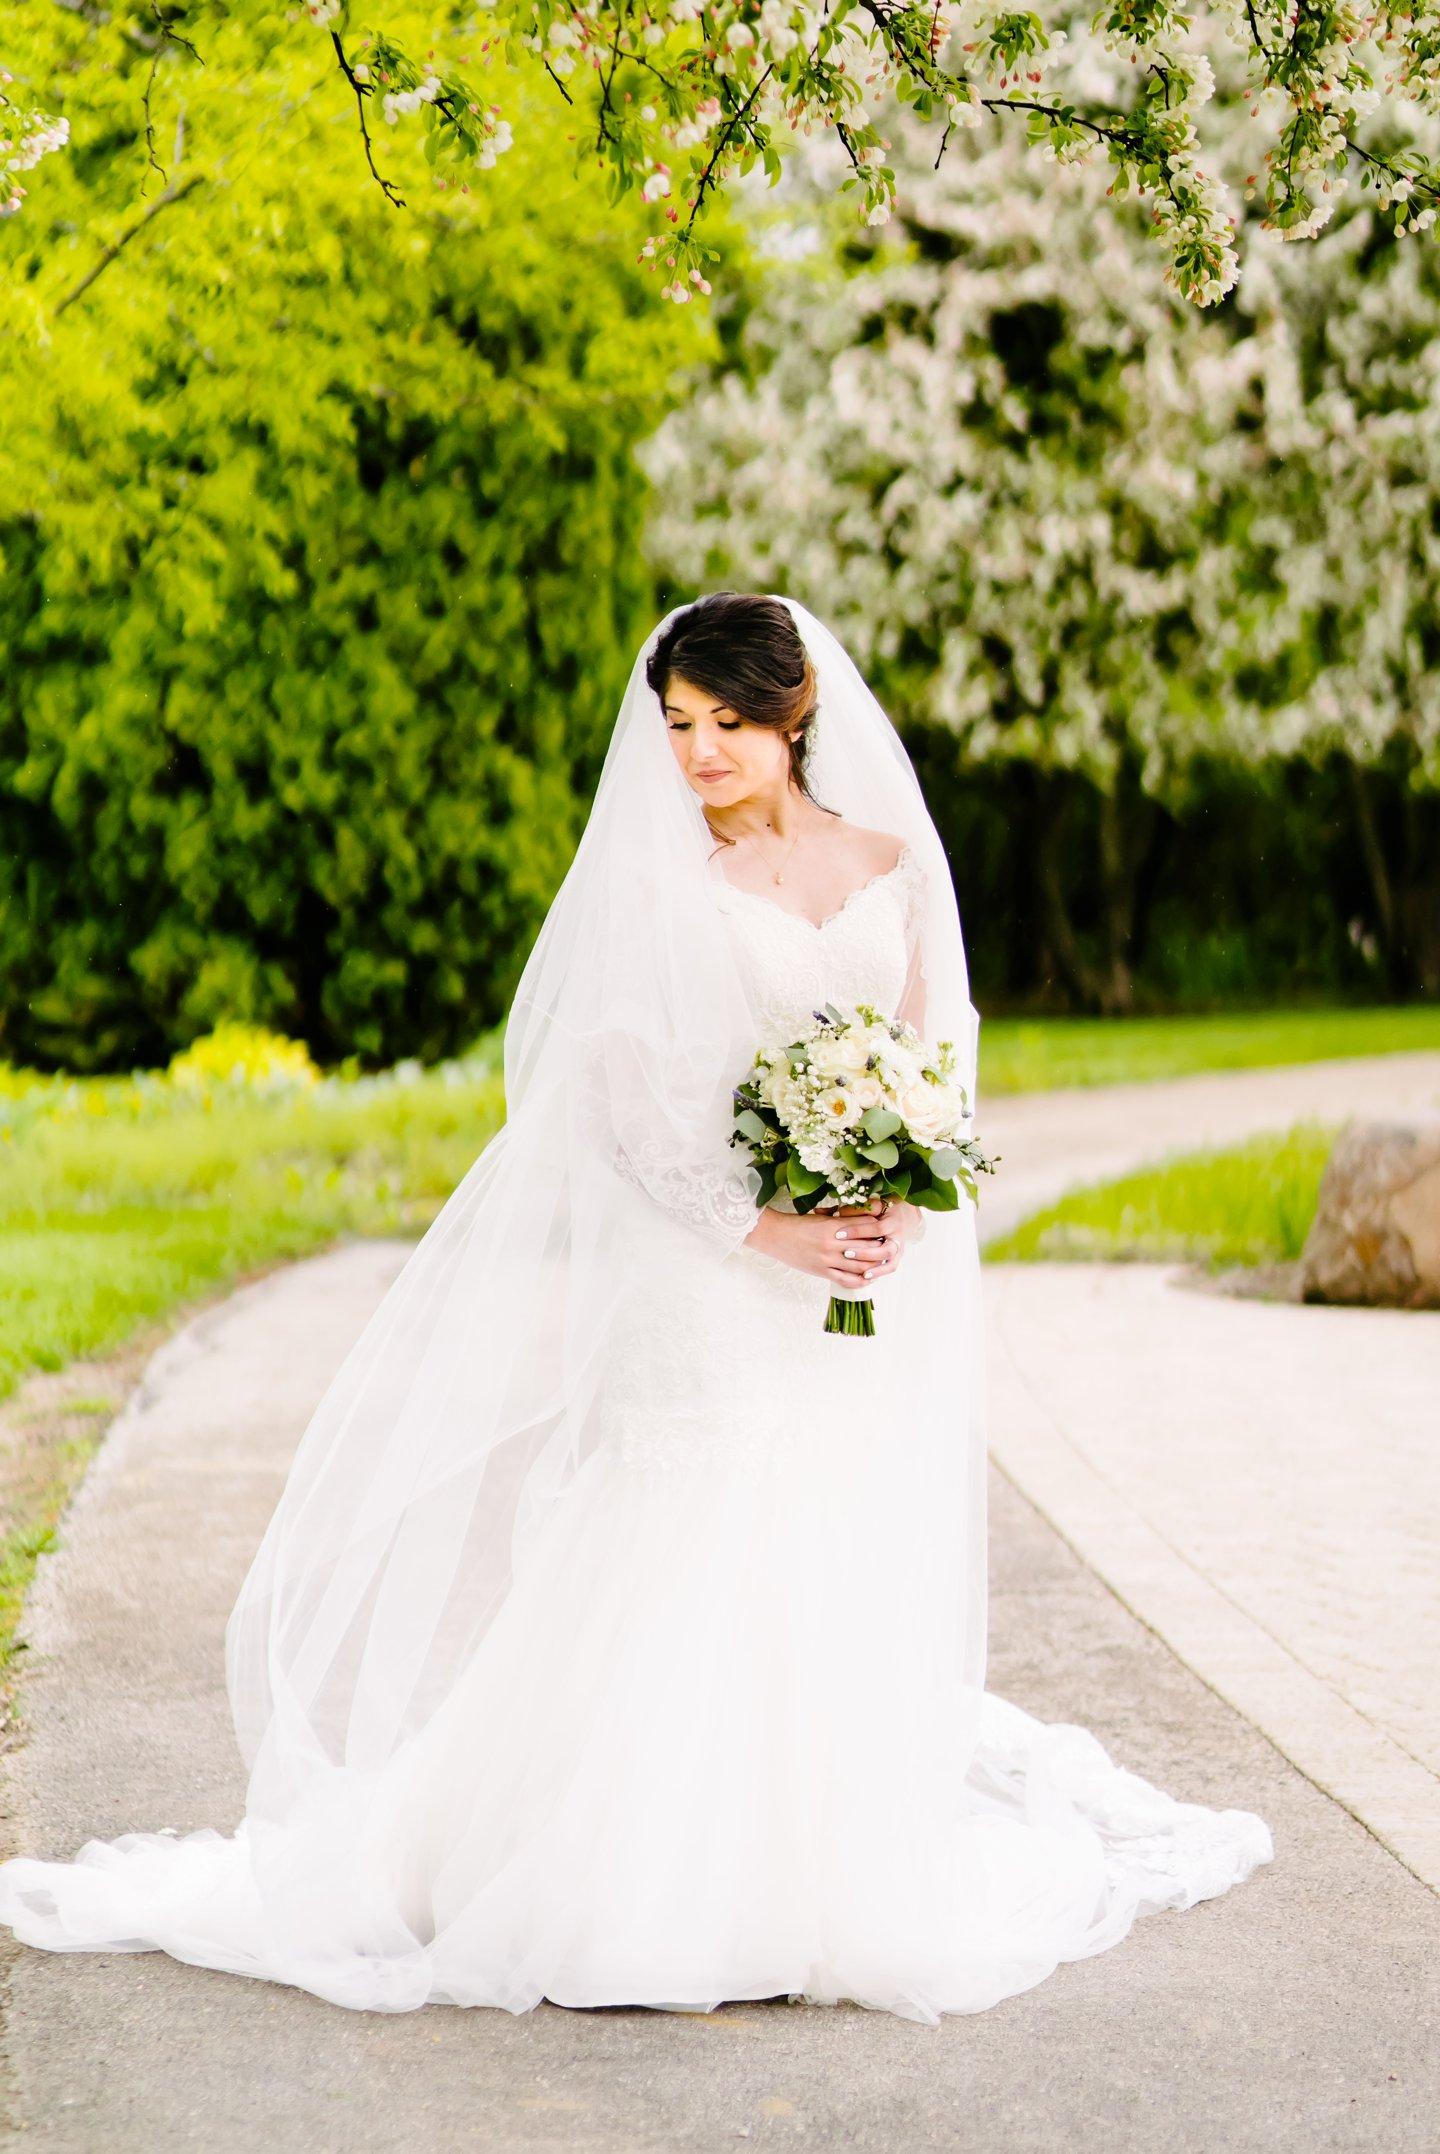 lake-geneva-fine-art-wedding-photographer-santos42